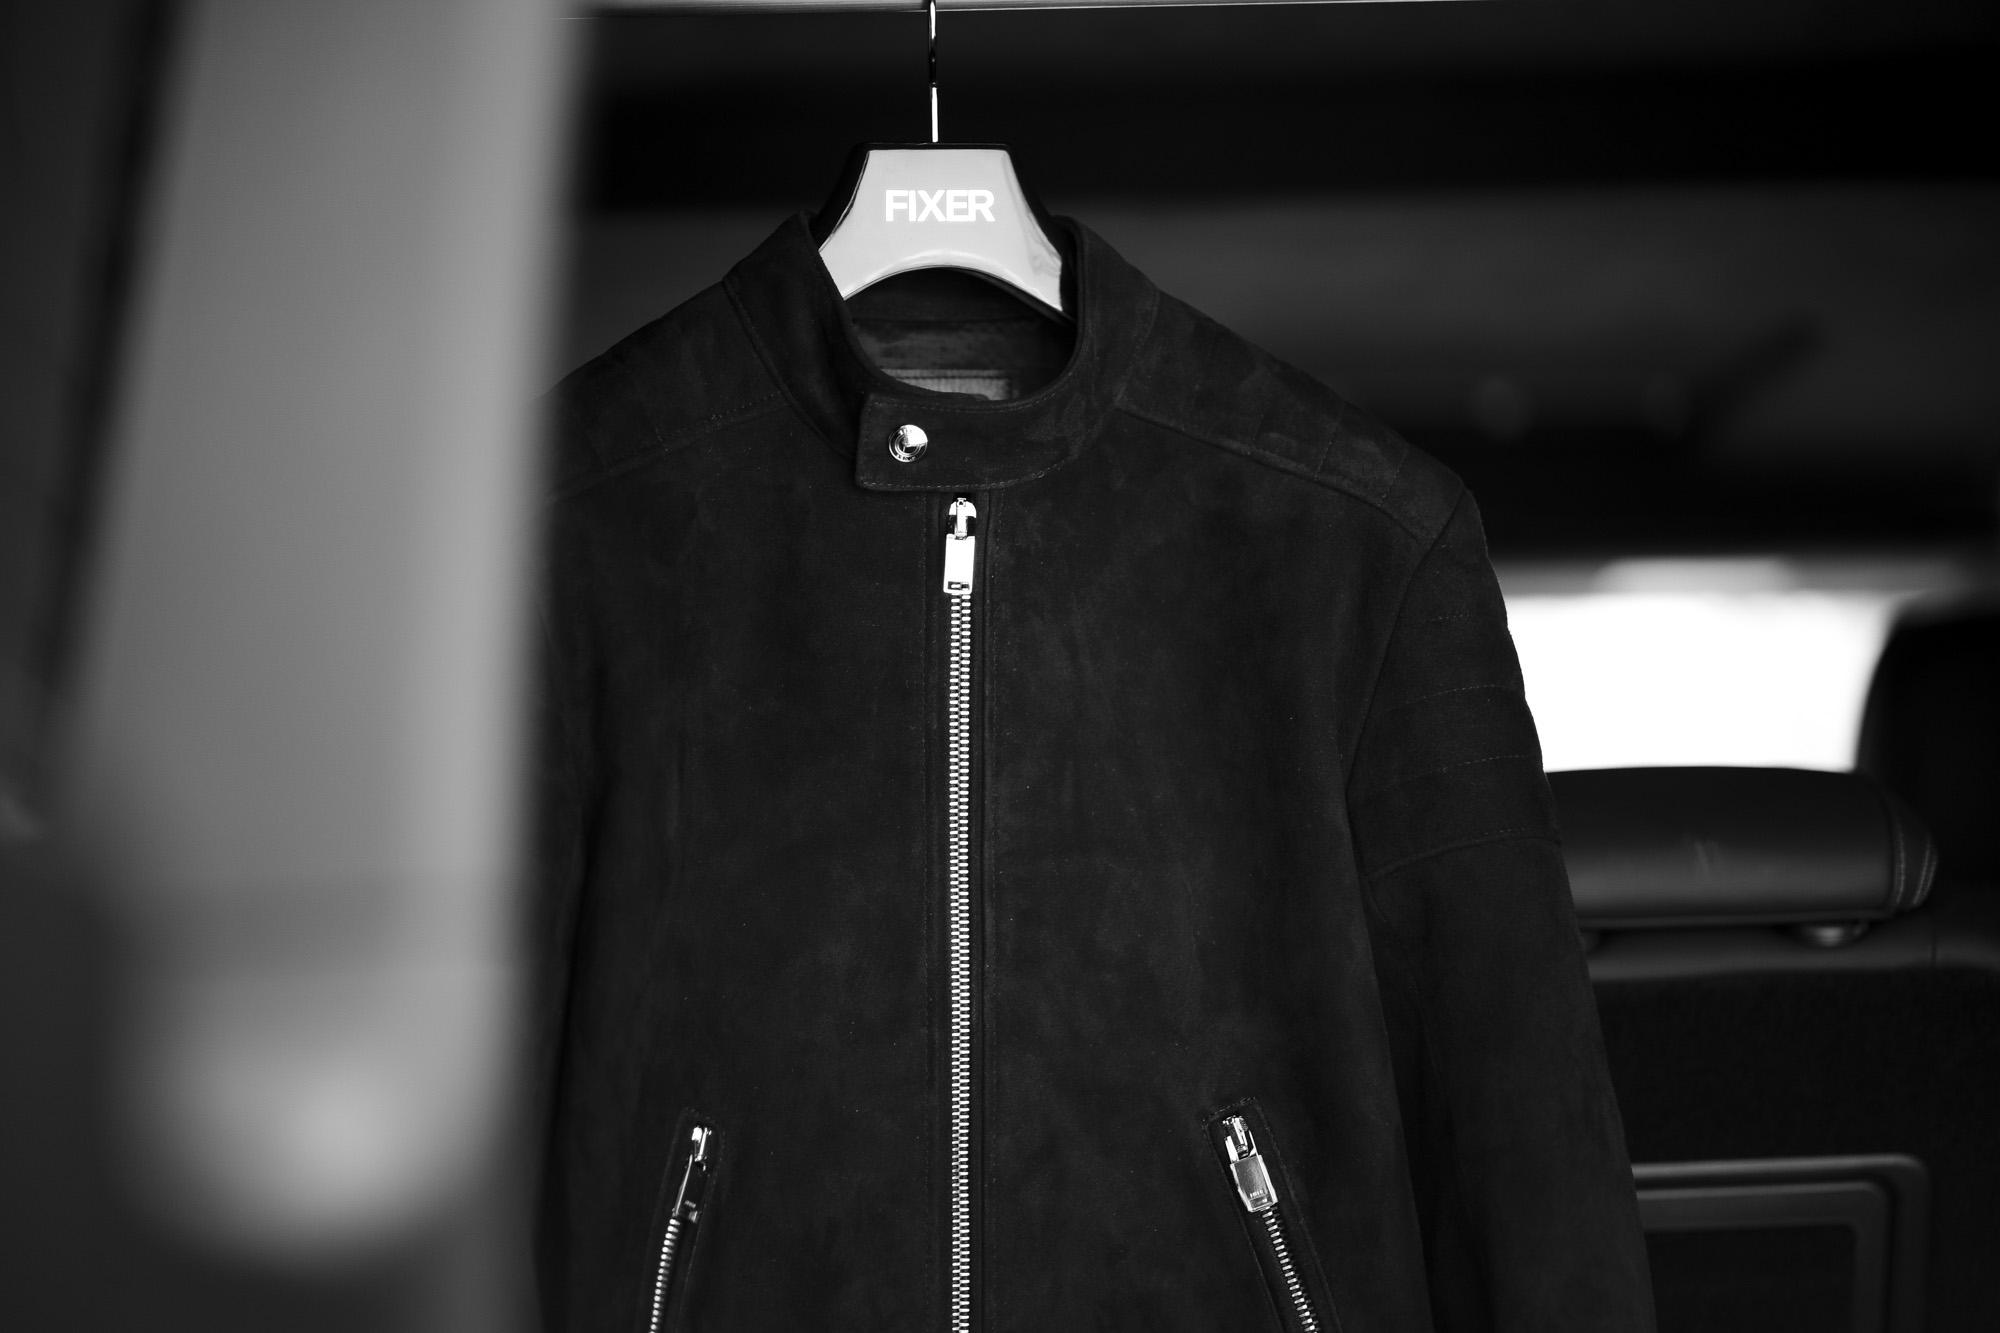 "FIXER F2 SINGLE RIDERS ""Cashmere Suede Leather"" BLACK フィクサー エフツー シングルライダース カシミヤスエードレザー ブラック 愛知 名古屋 Alto e Diritto altoediritto アルトエデリット Coming soon"